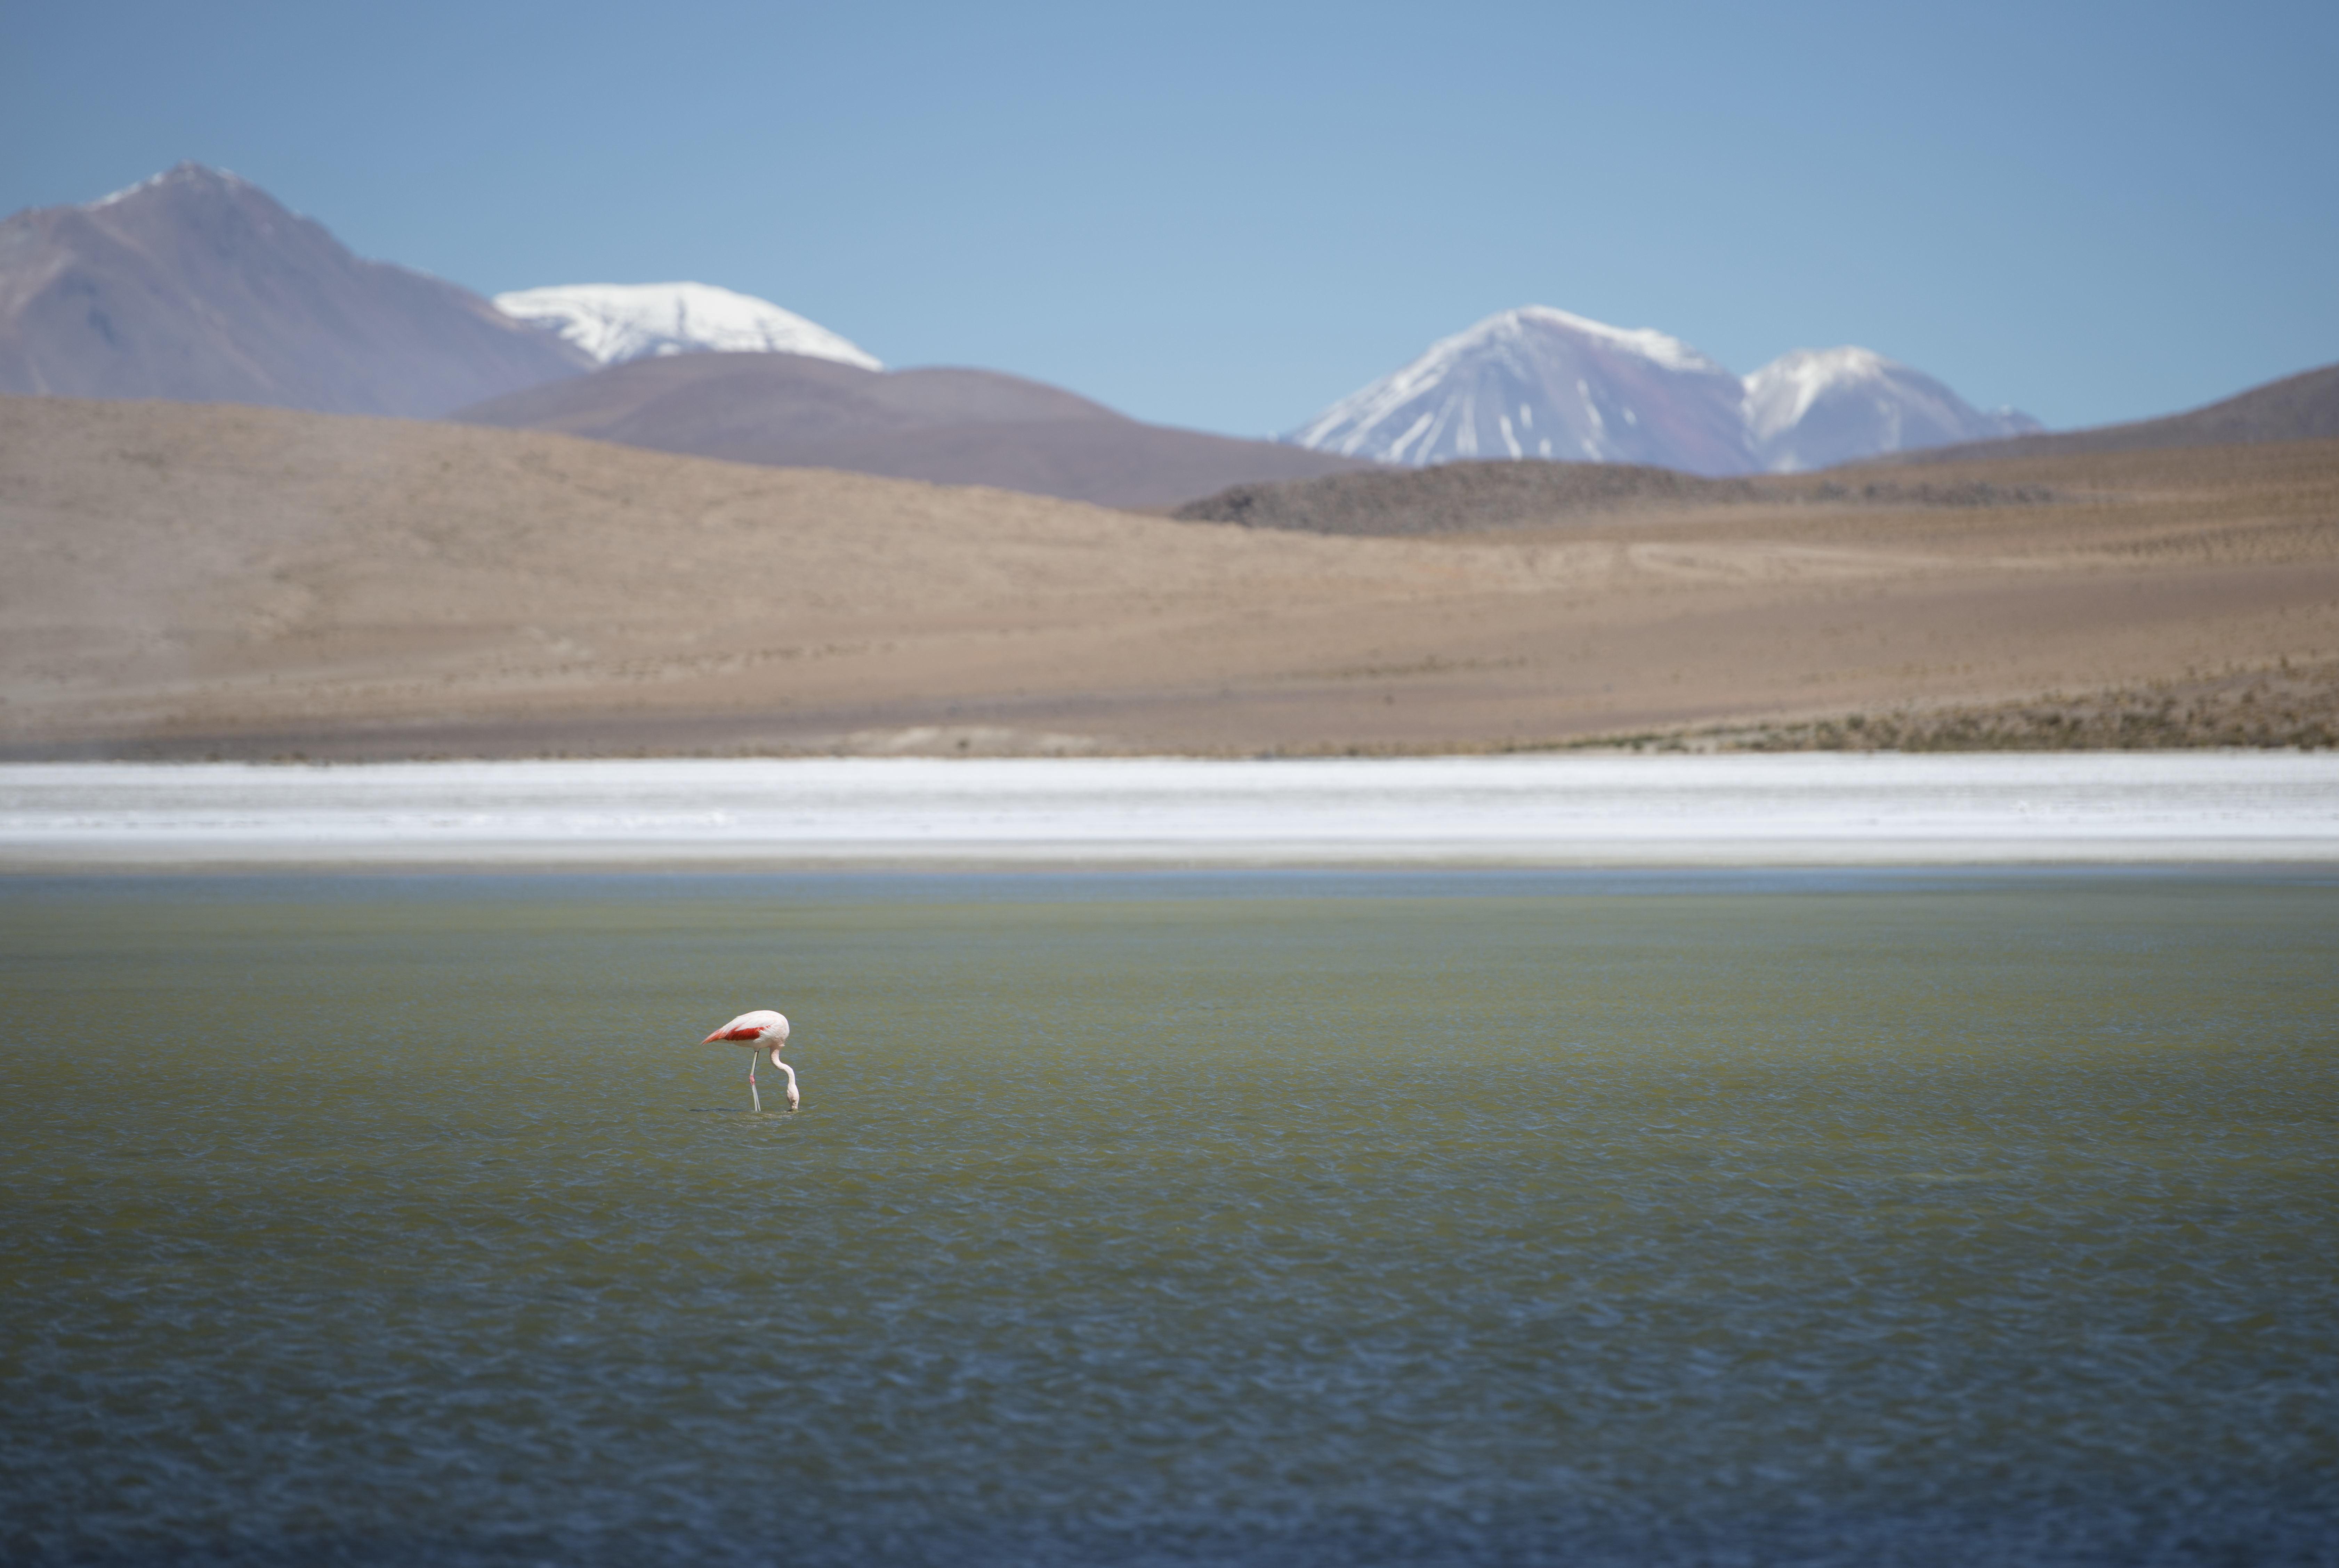 Flamingo_01